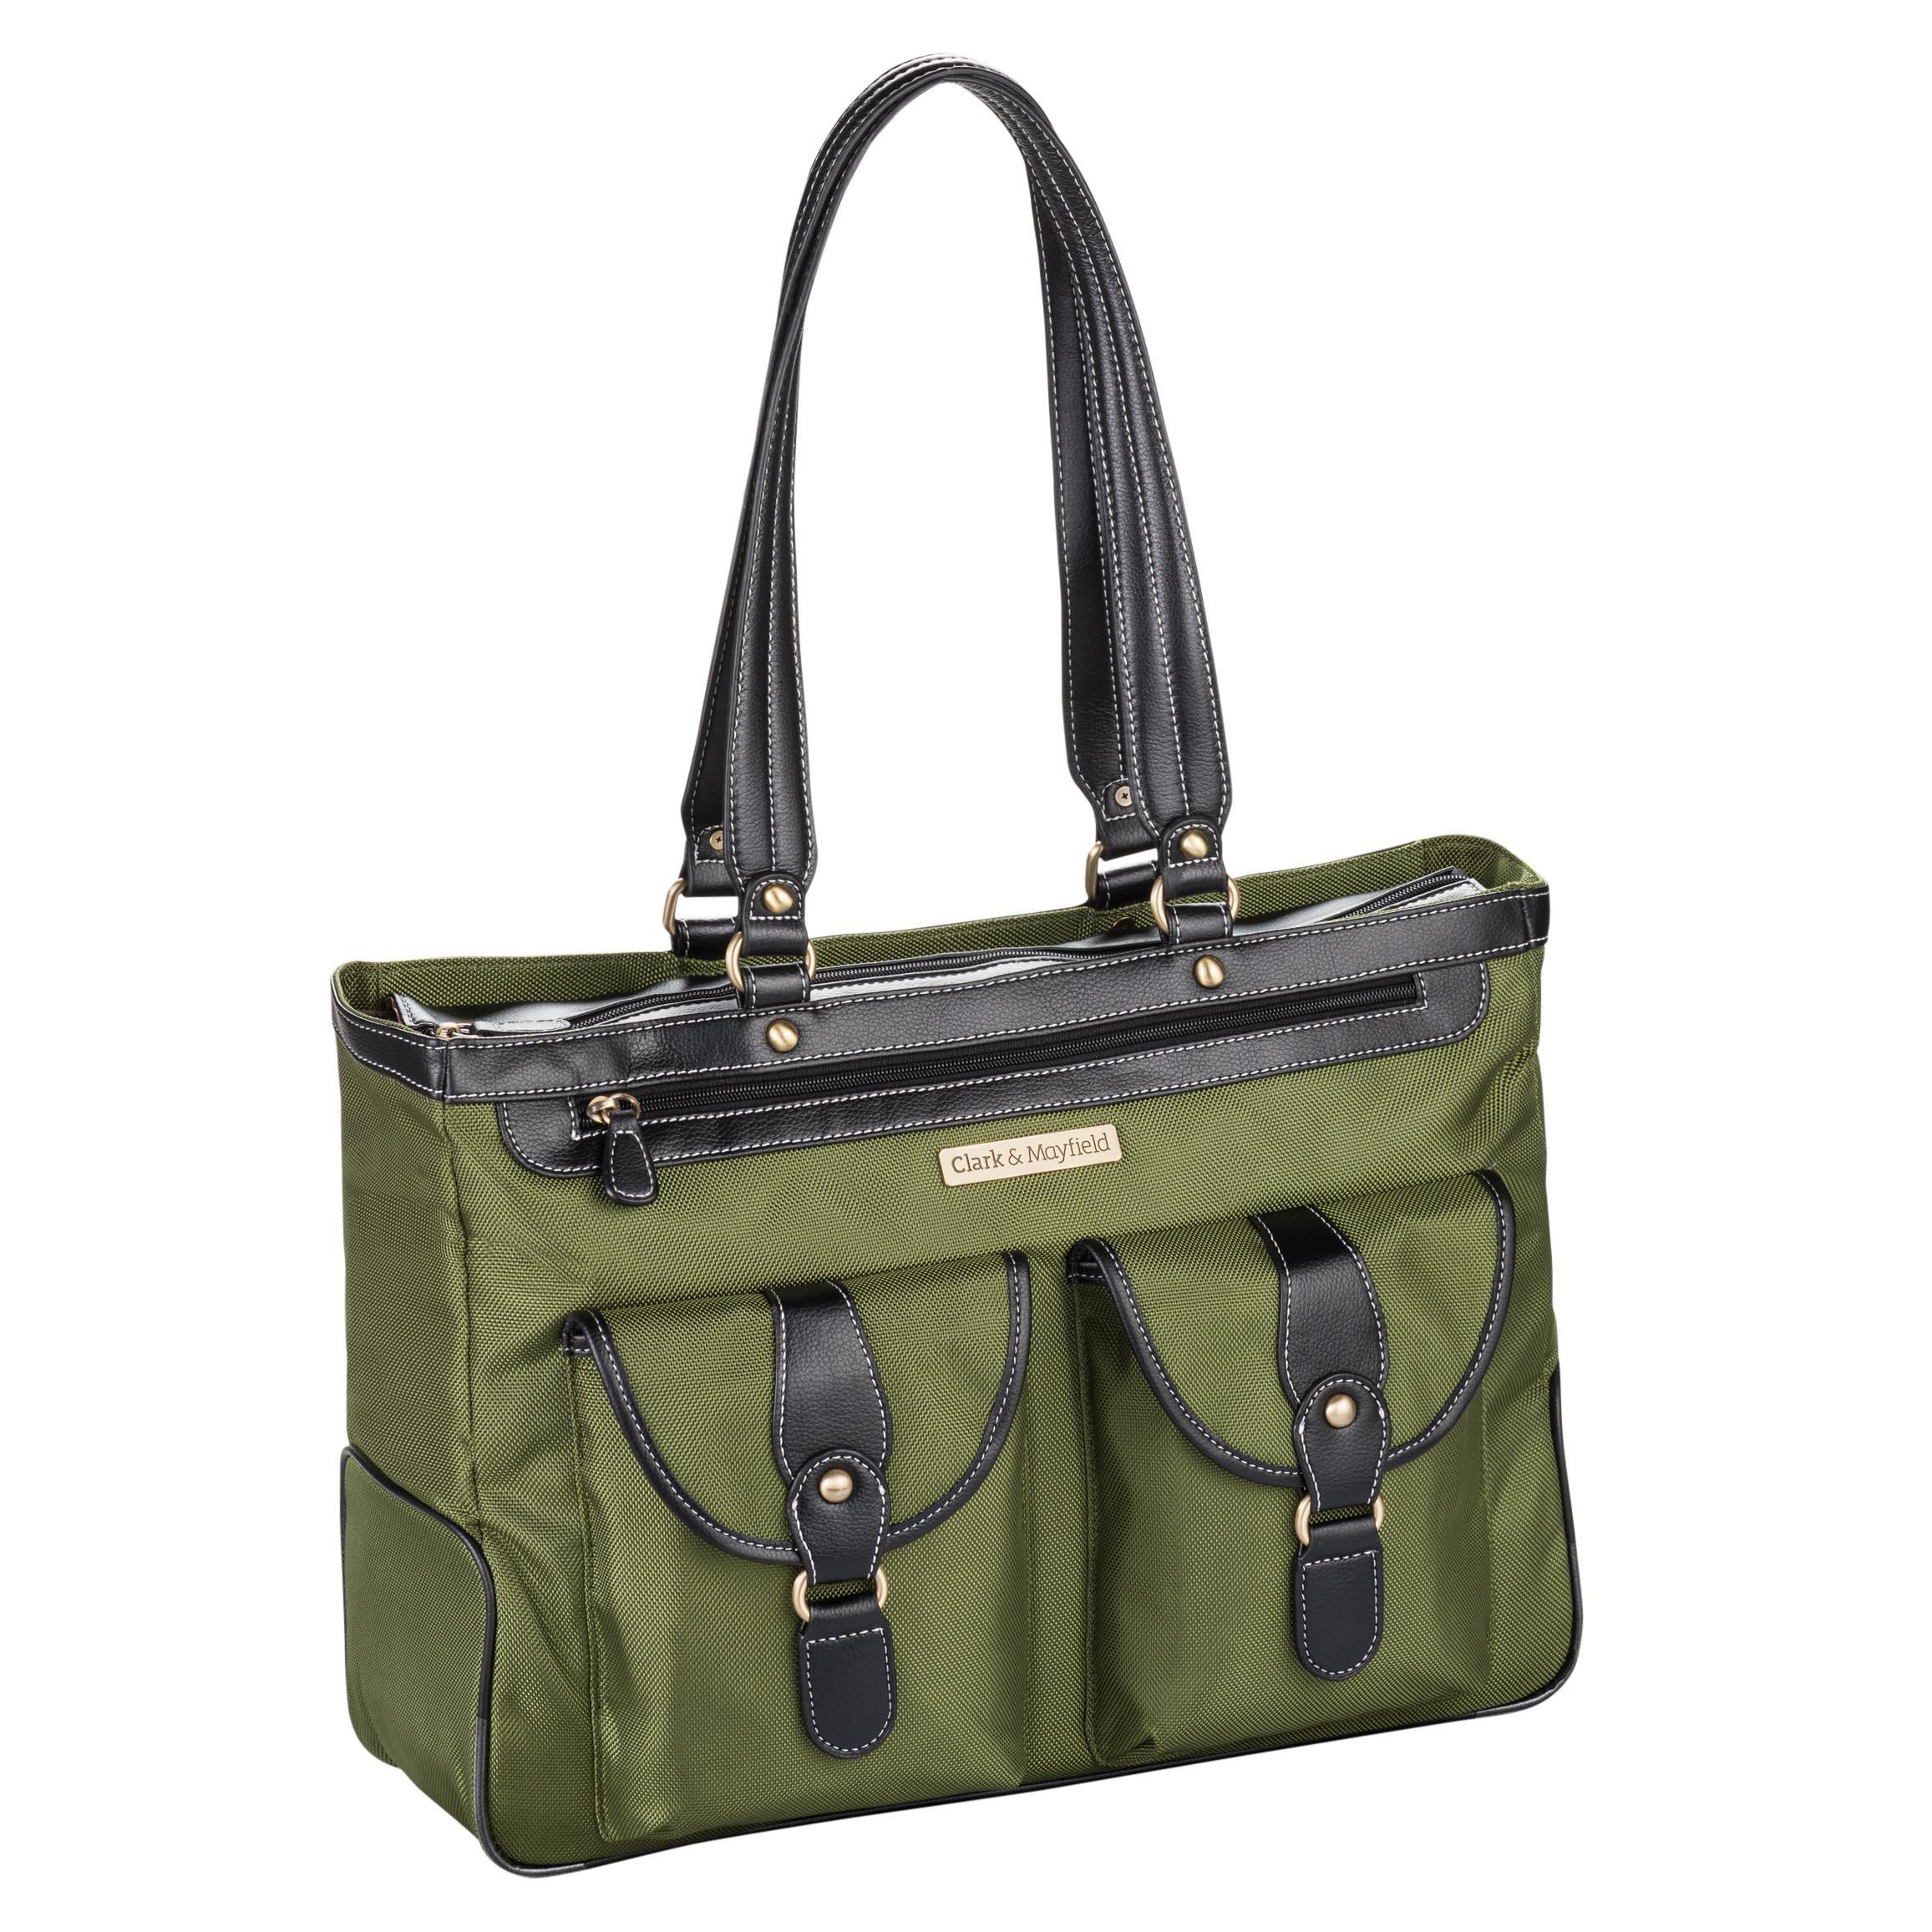 Clark & Mayfield Marquam Laptop Handbag 18.4'' (Pesto Green) by Clark & Mayfield